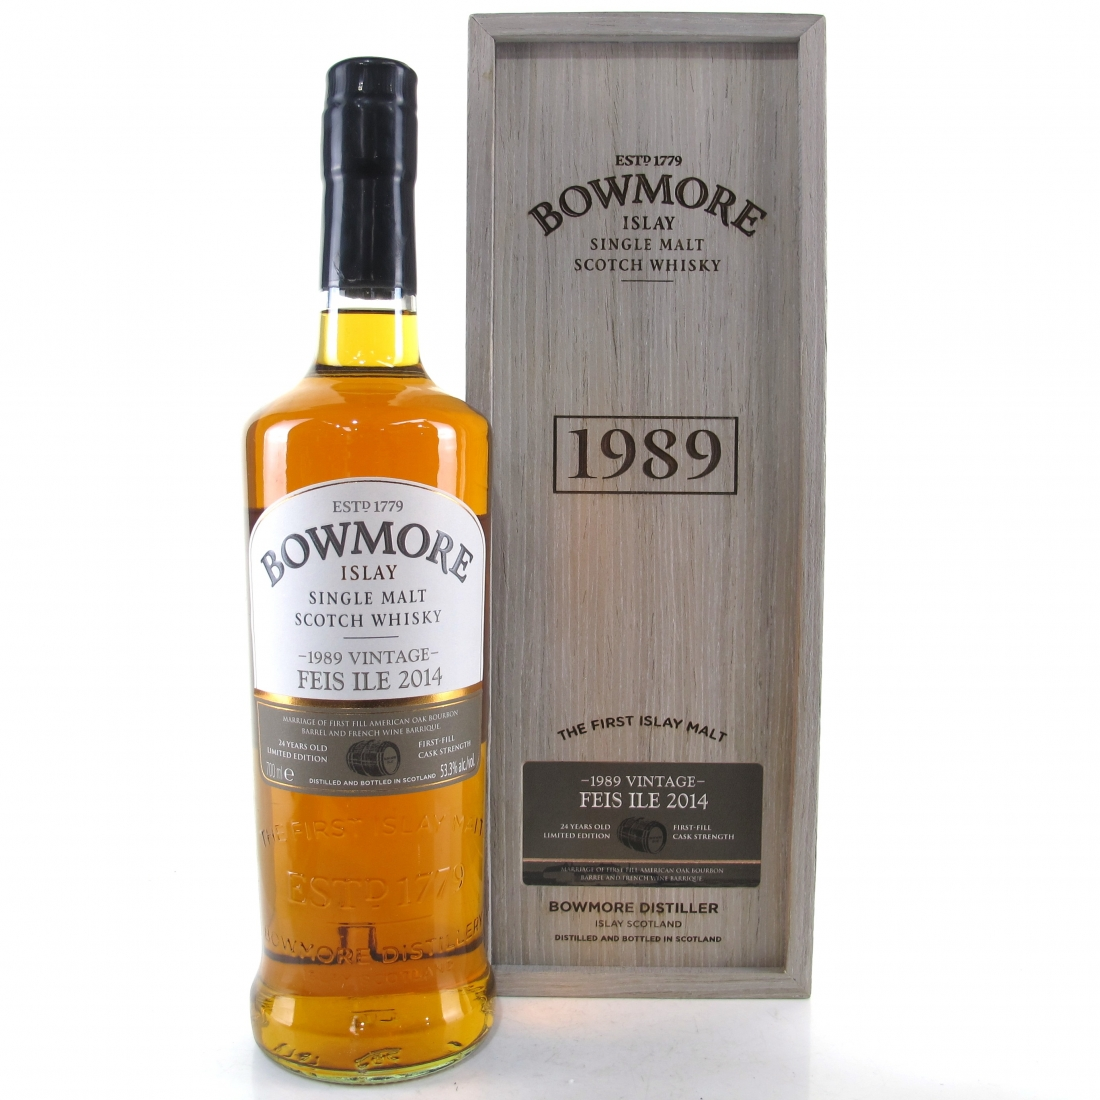 Bowmore 1989 24 Year Old Feis Ile 2014